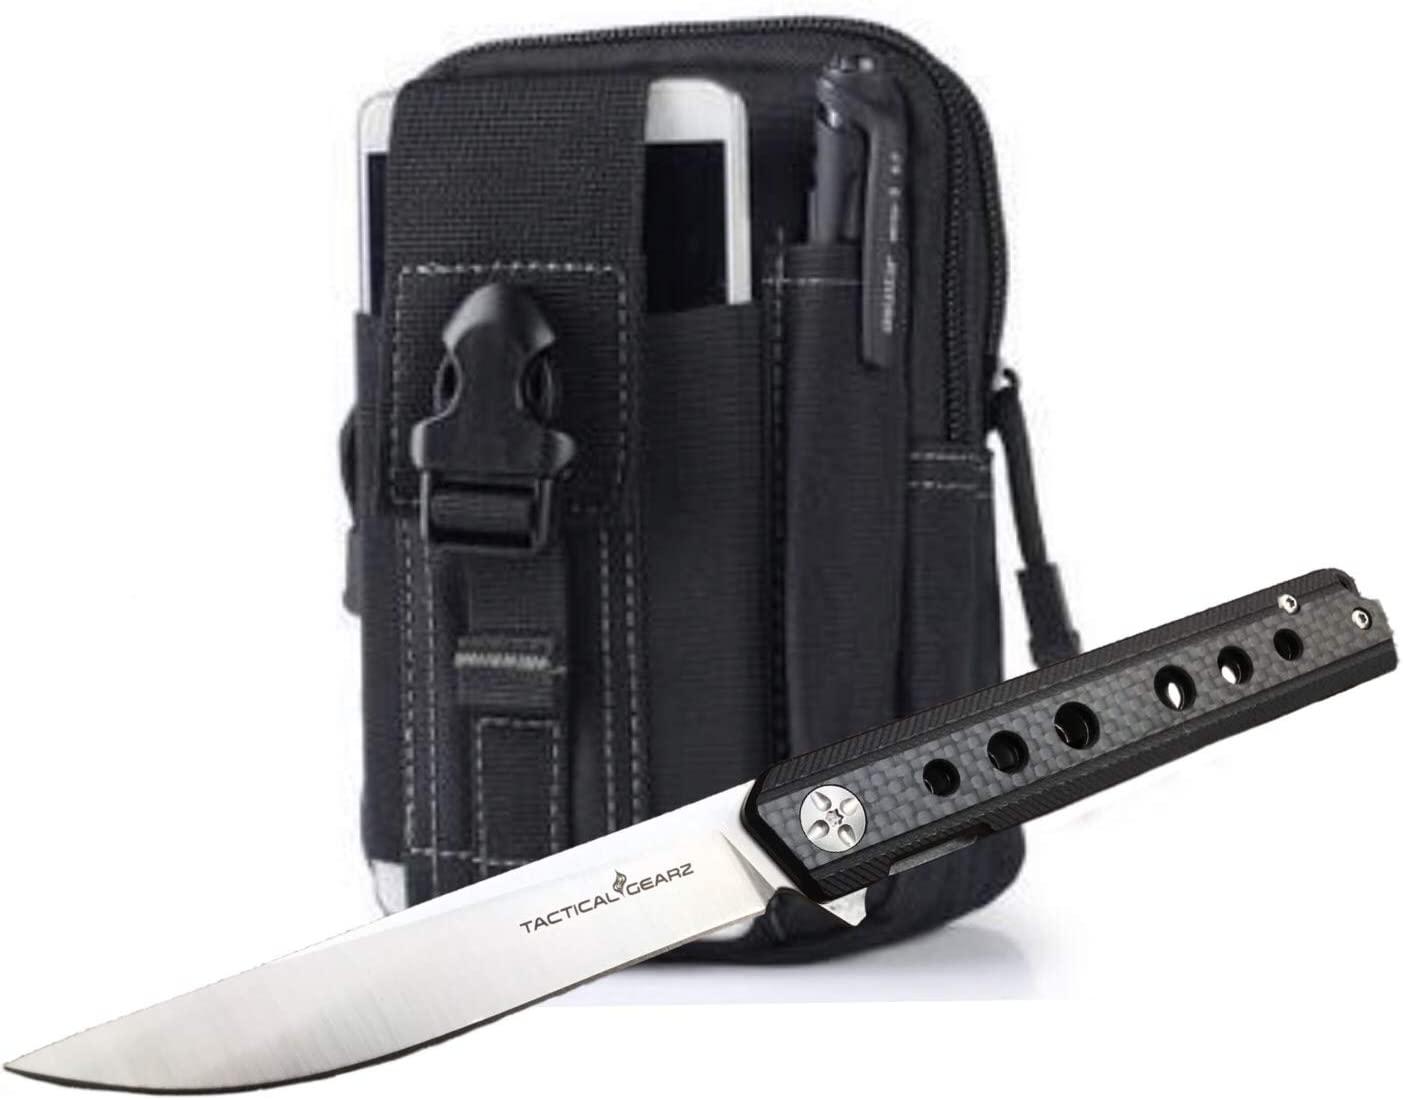 TACTICAL GEARZ Carbon Fiber Pocket Knife! TG Torus, Solid Carbon Fiber Handle! Razor Sharp D2 Steel Blade! Ball Bearing Pivot System Open! Includes Sheath!